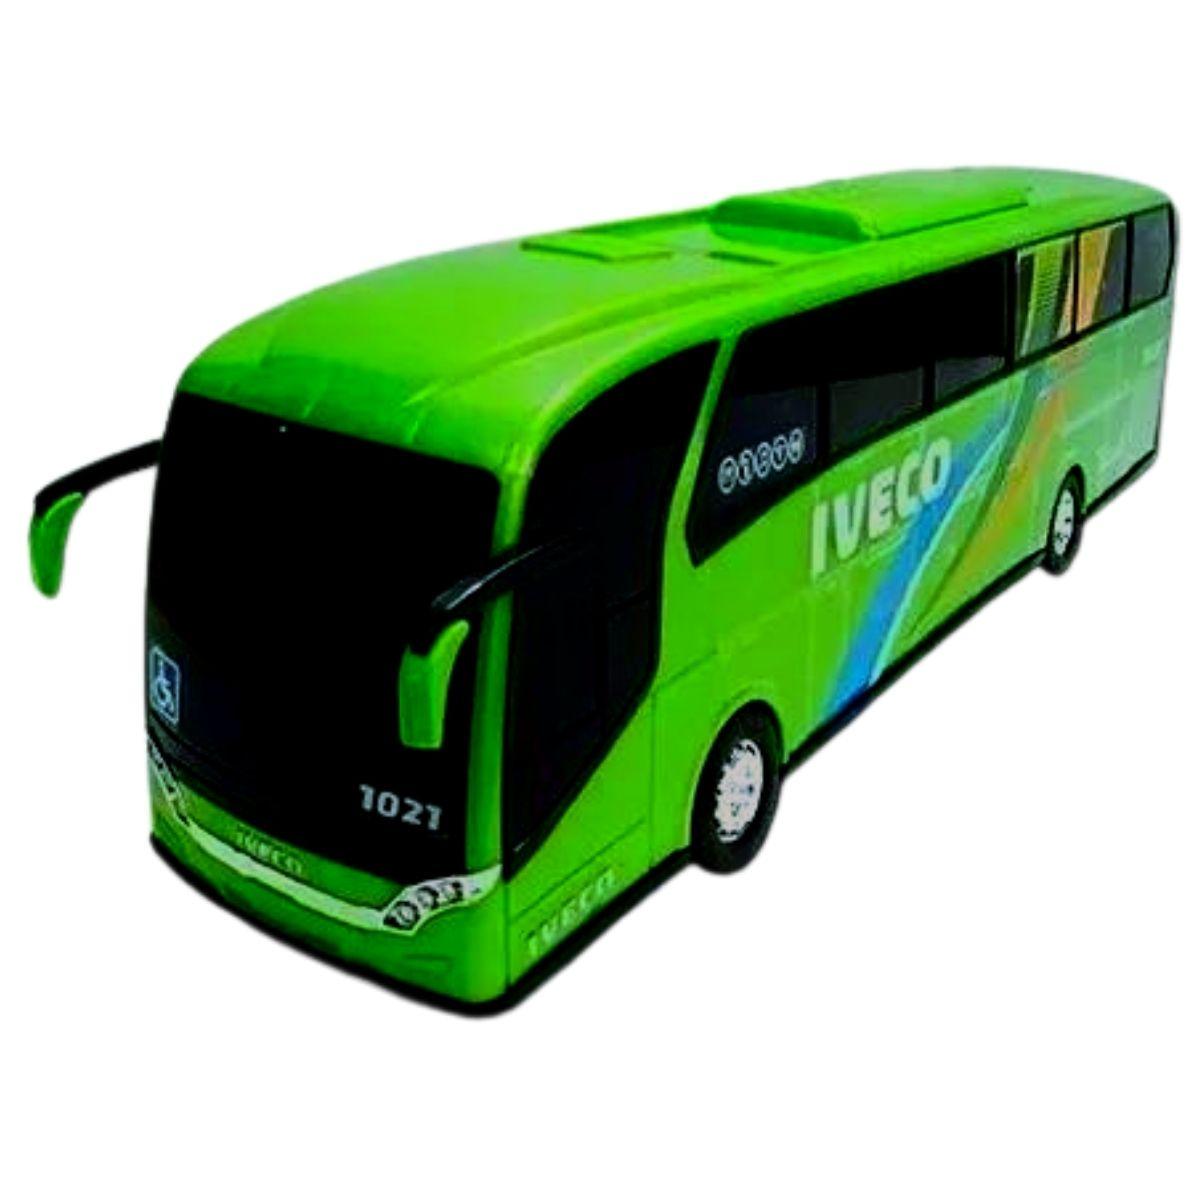 Ônibus Iveco Usual 42cm Carrinho Brinquedo - Usual